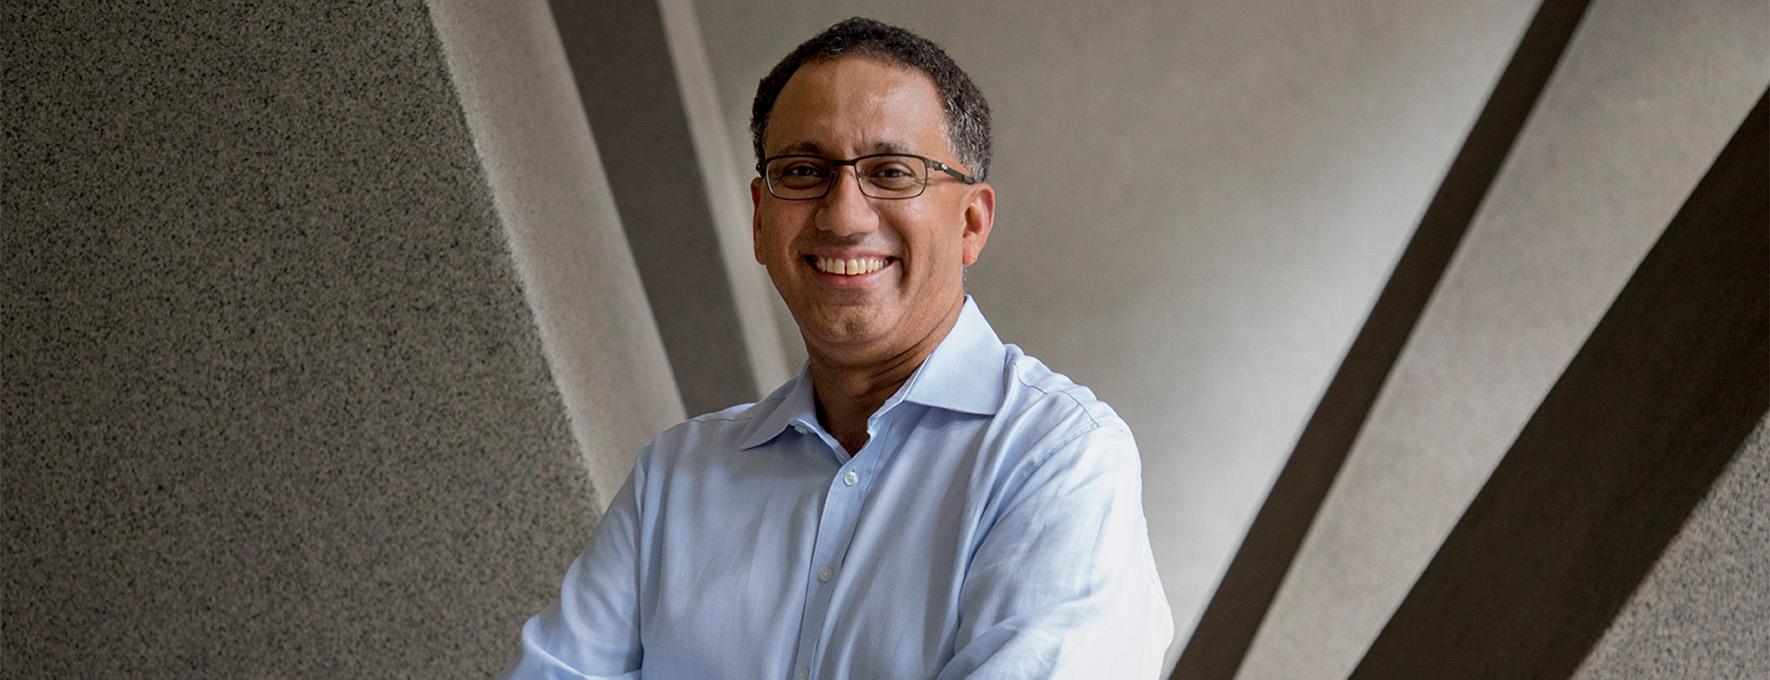 SiteMinder CEO Sankar Narayan announces pre-IPO funding - BlackRock, AustralianSuper, Fidelity International